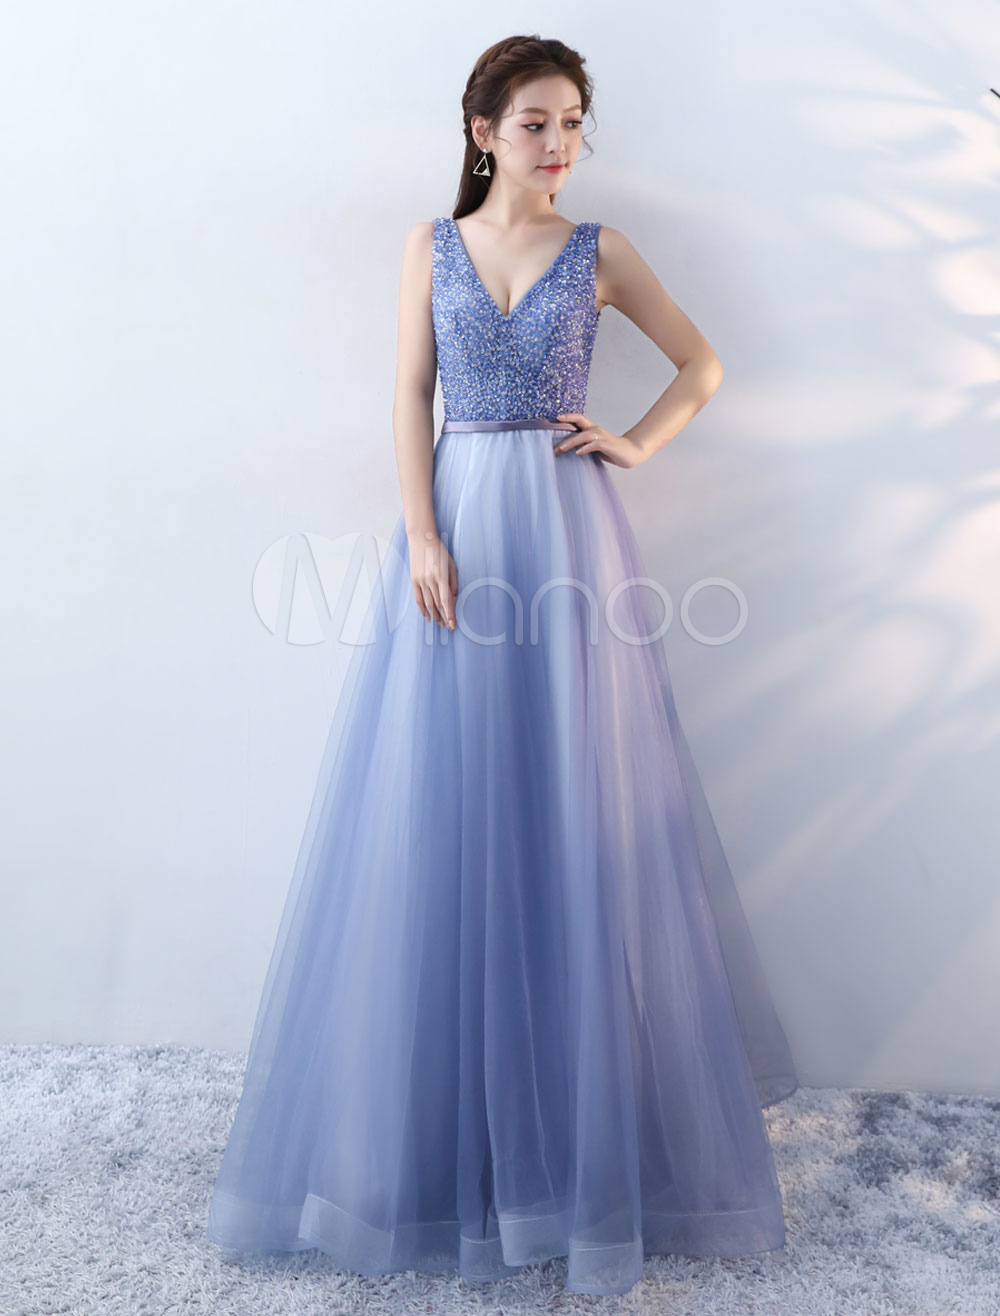 Prom Dresses Long V Neck Beaded Royal Blue Backless Floor Length Formal Party Dress